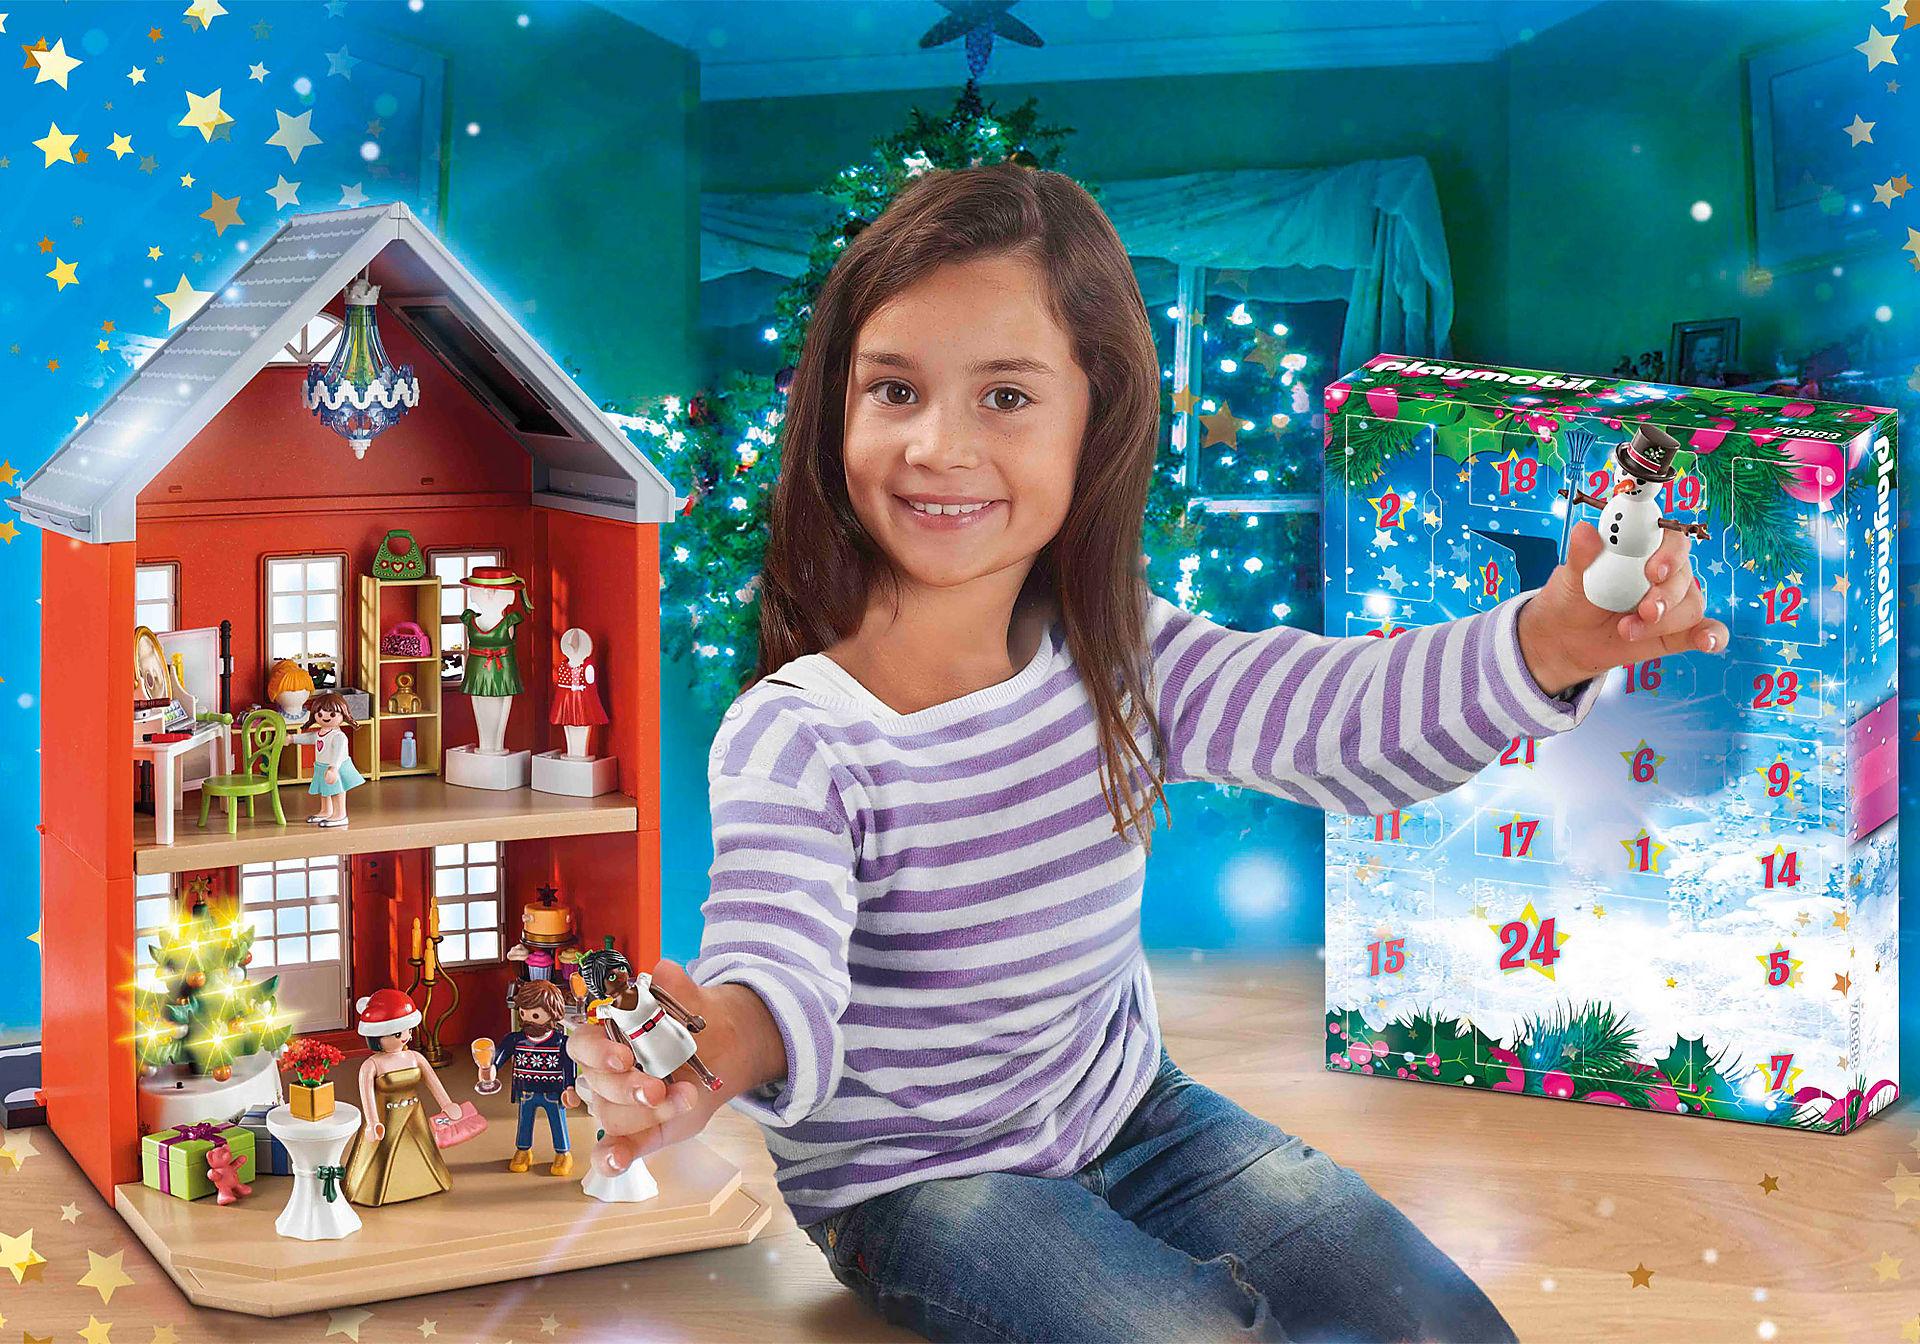 70383 Jumbo Advent Calendar - Family Christmas zoom image1